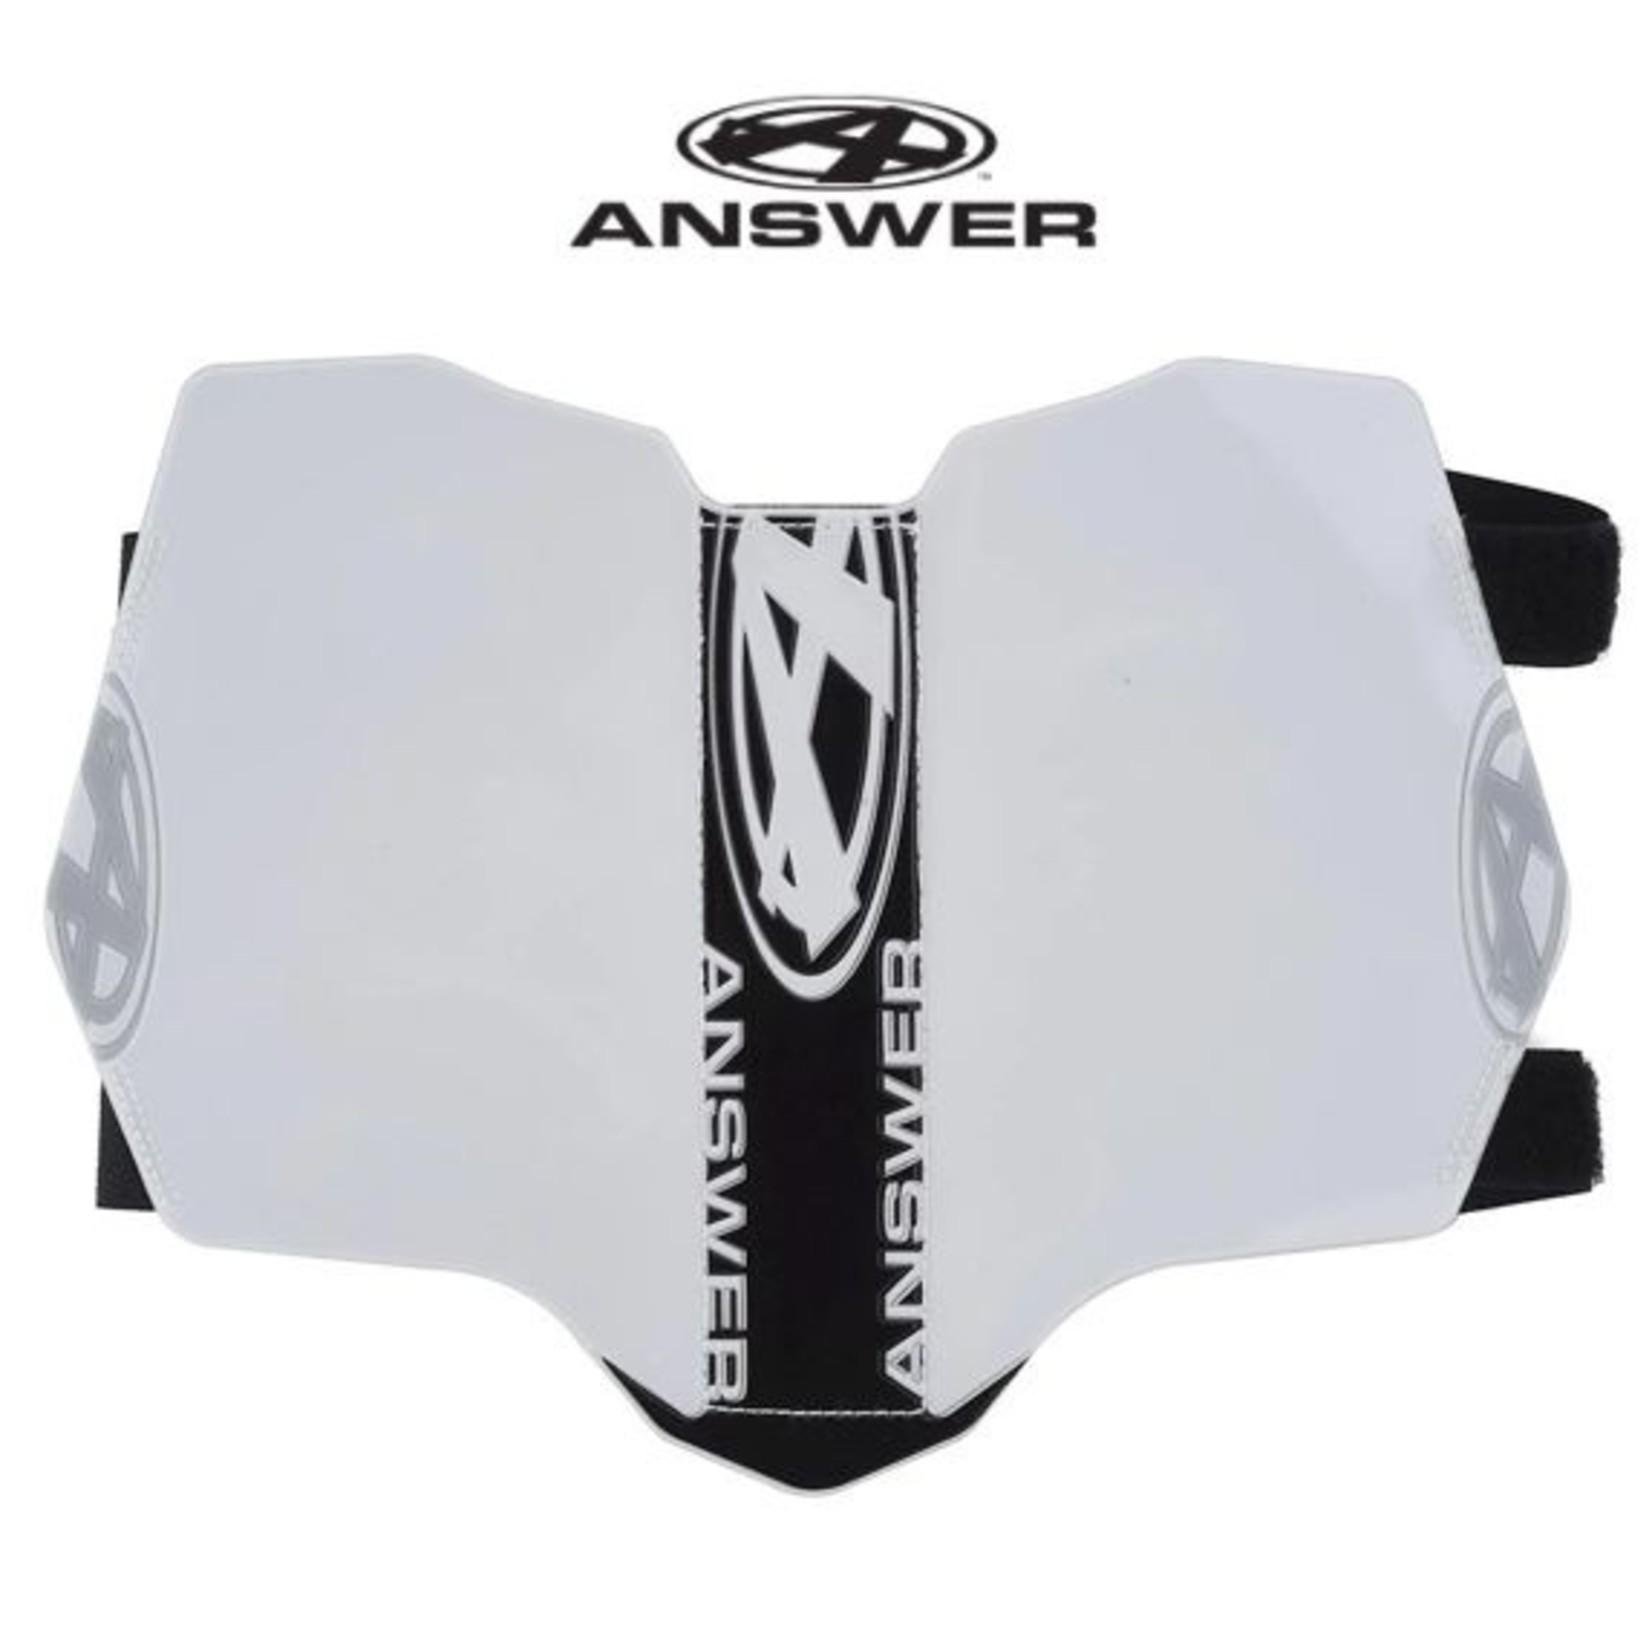 Answer BMX Answer Side Plate